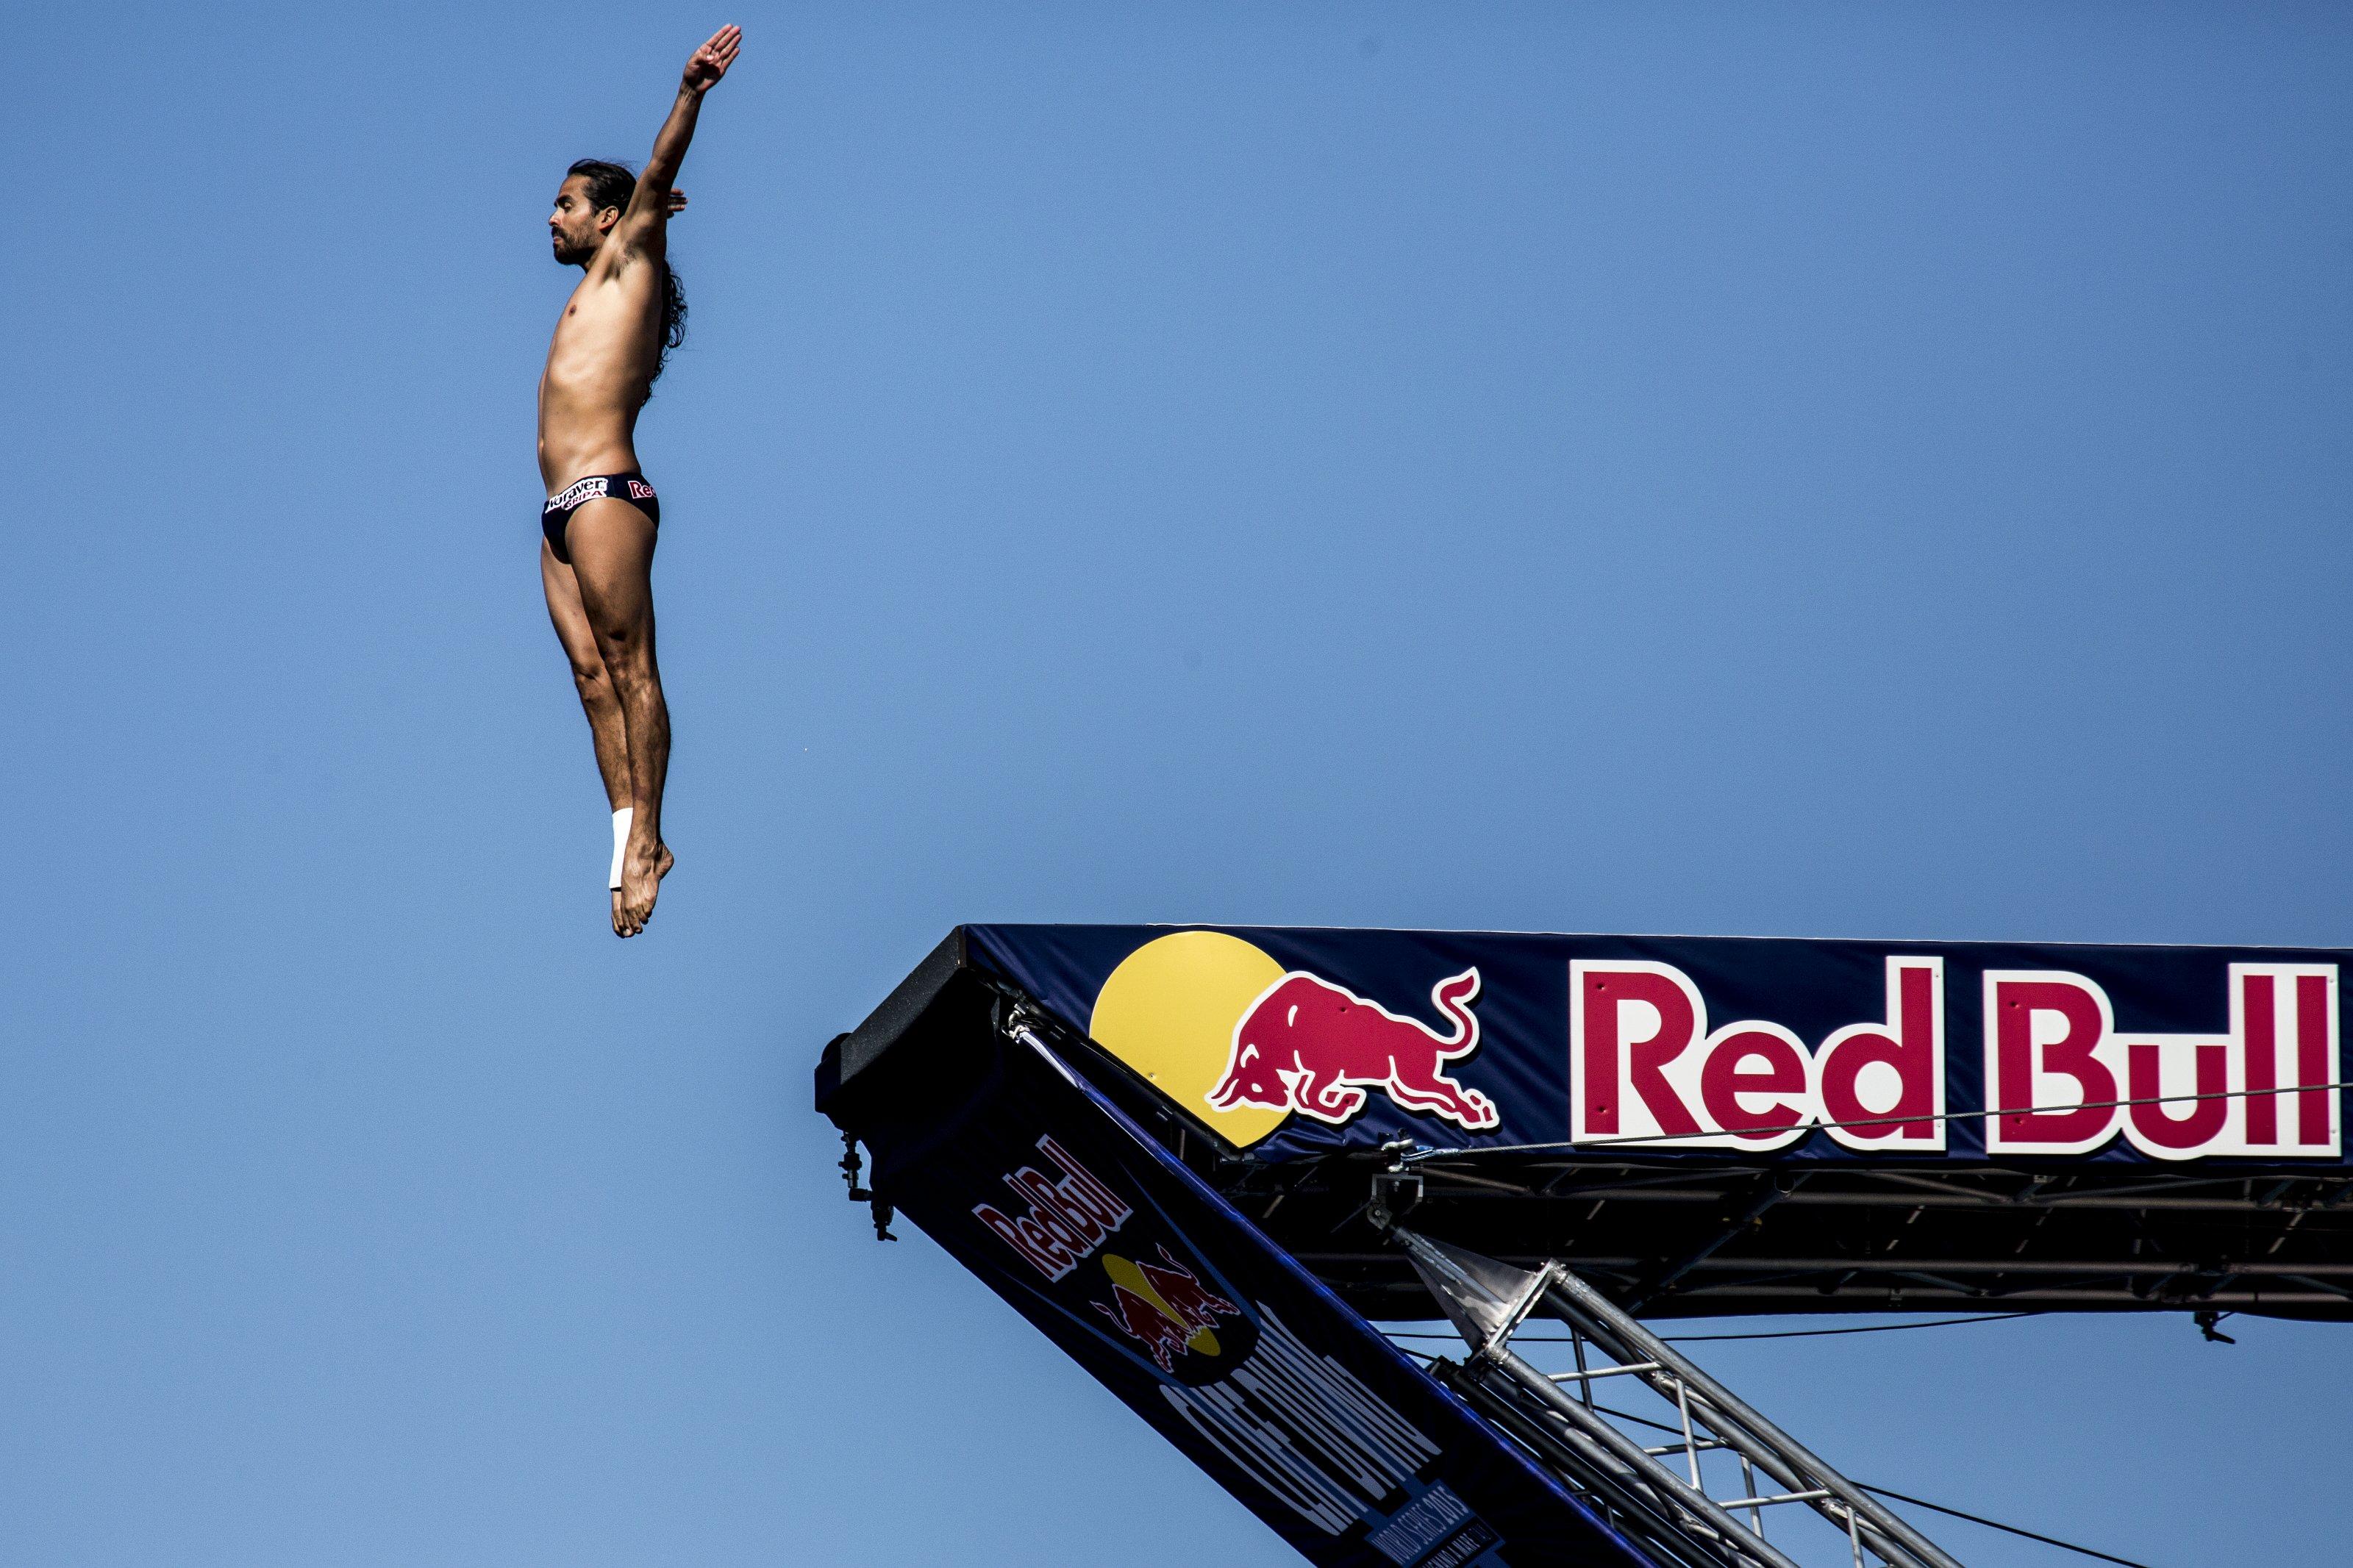 Red bull cliff diving wer qualifiziert sich f r die n chste saison trends trendsport - Red bull content pool ...